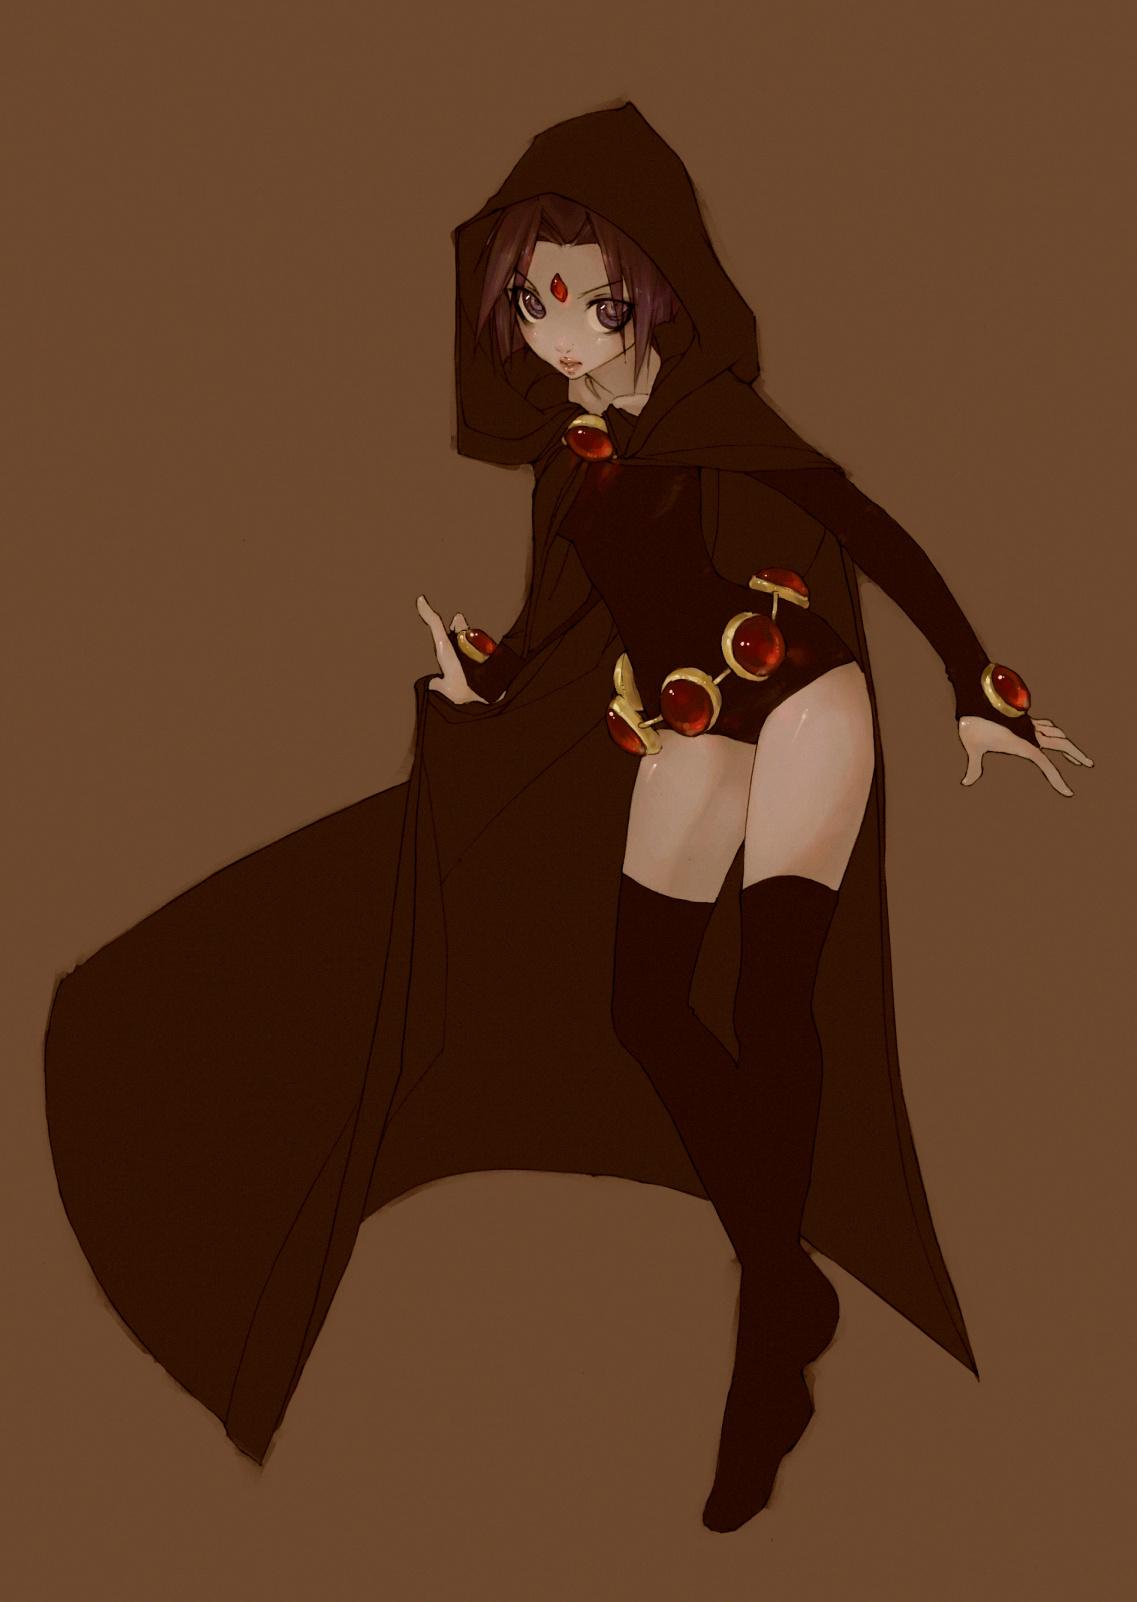 Raven Teen Titans - The Teen Titans - Zerochan Anime -5968